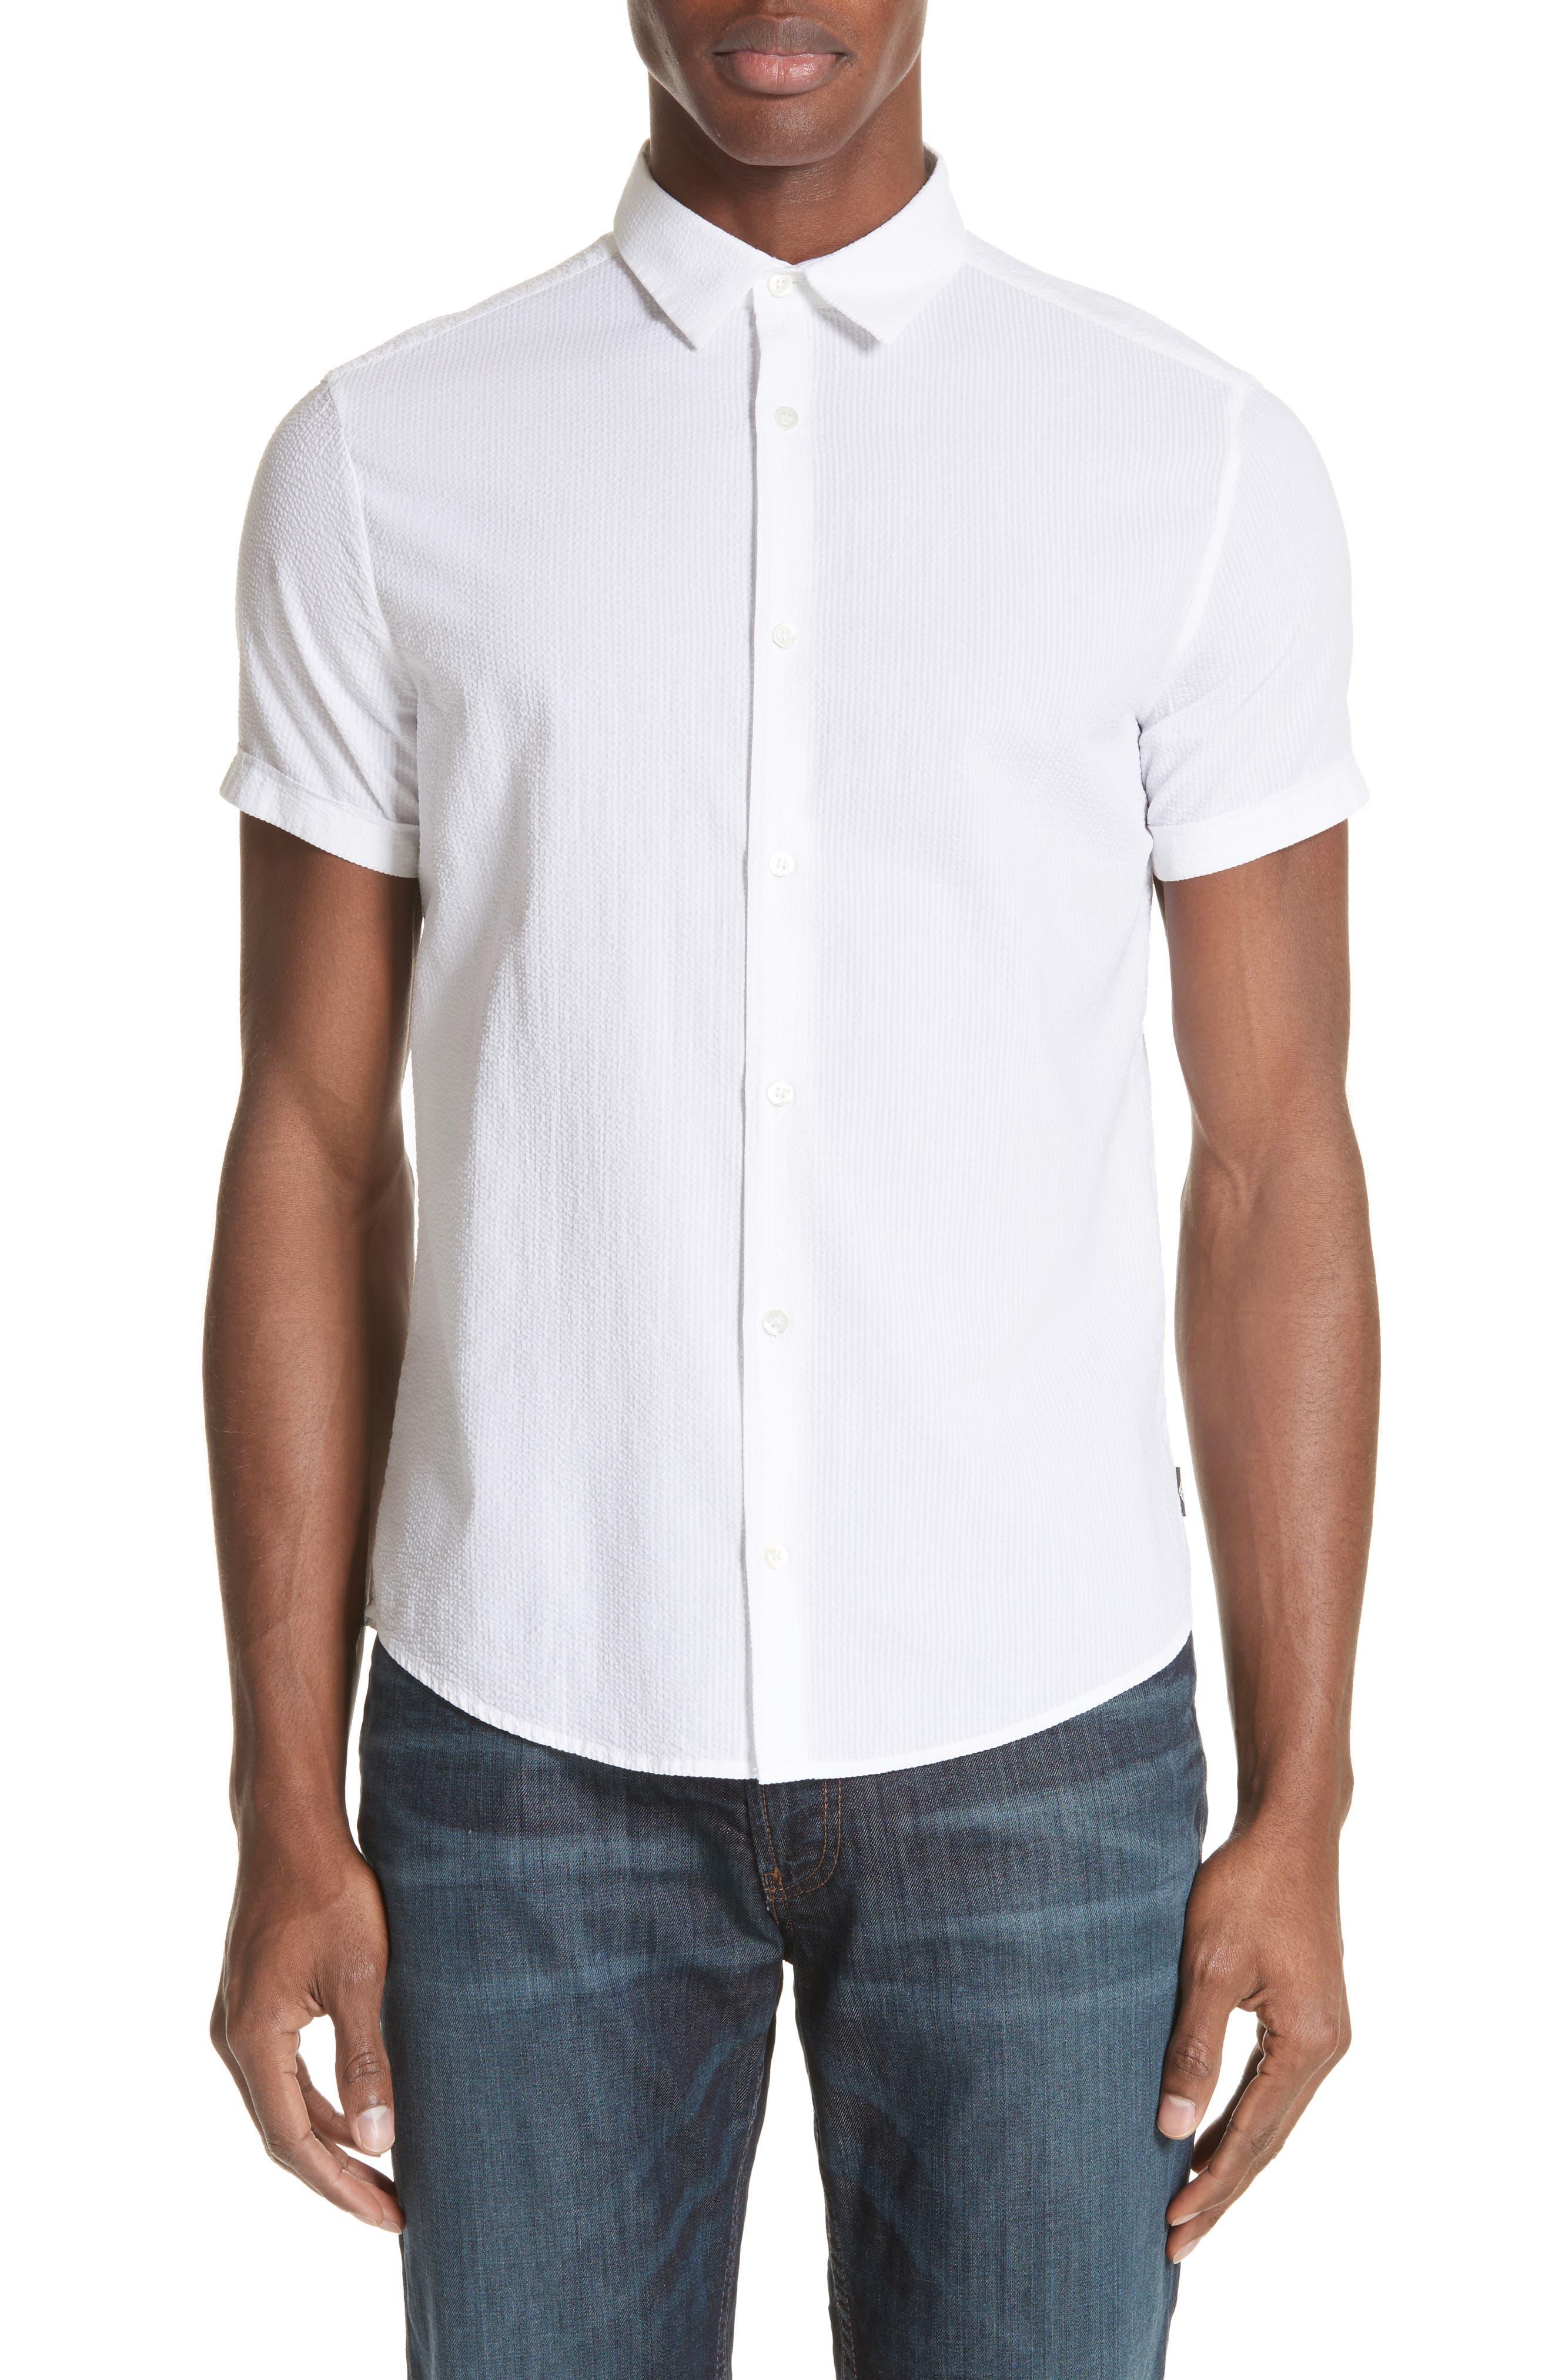 Emporio Armani Regular Fit Short Sleeve Dress Shirt